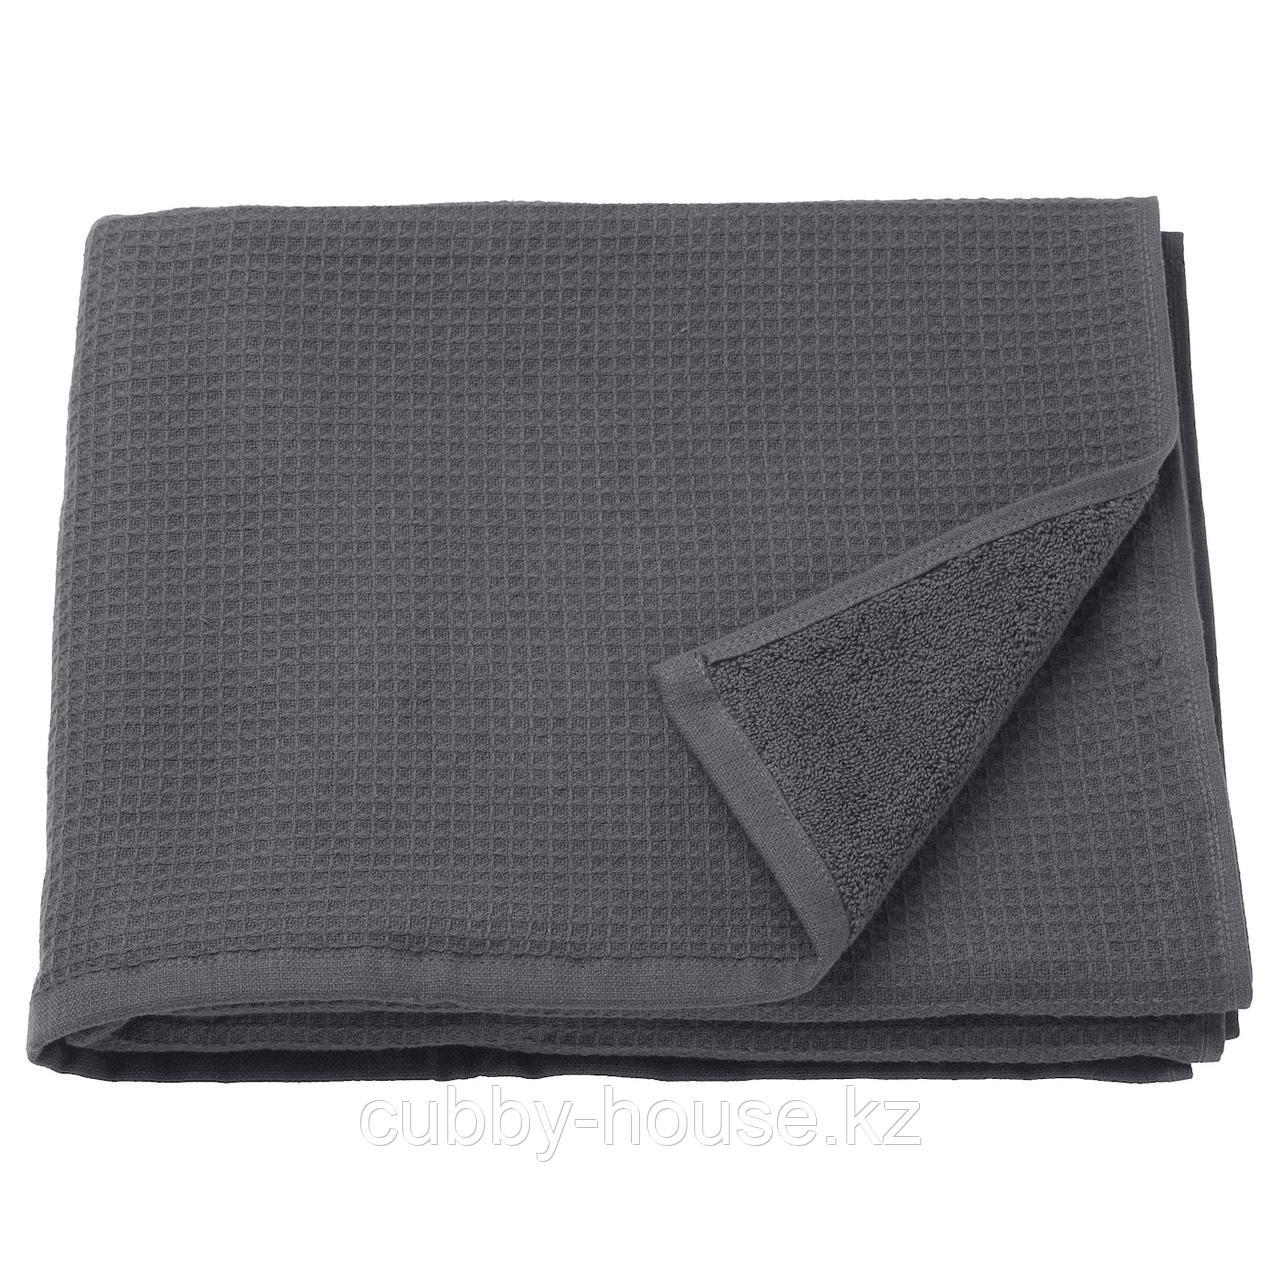 САЛЬВИКЕН Банное полотенце, белый, 70x140 см